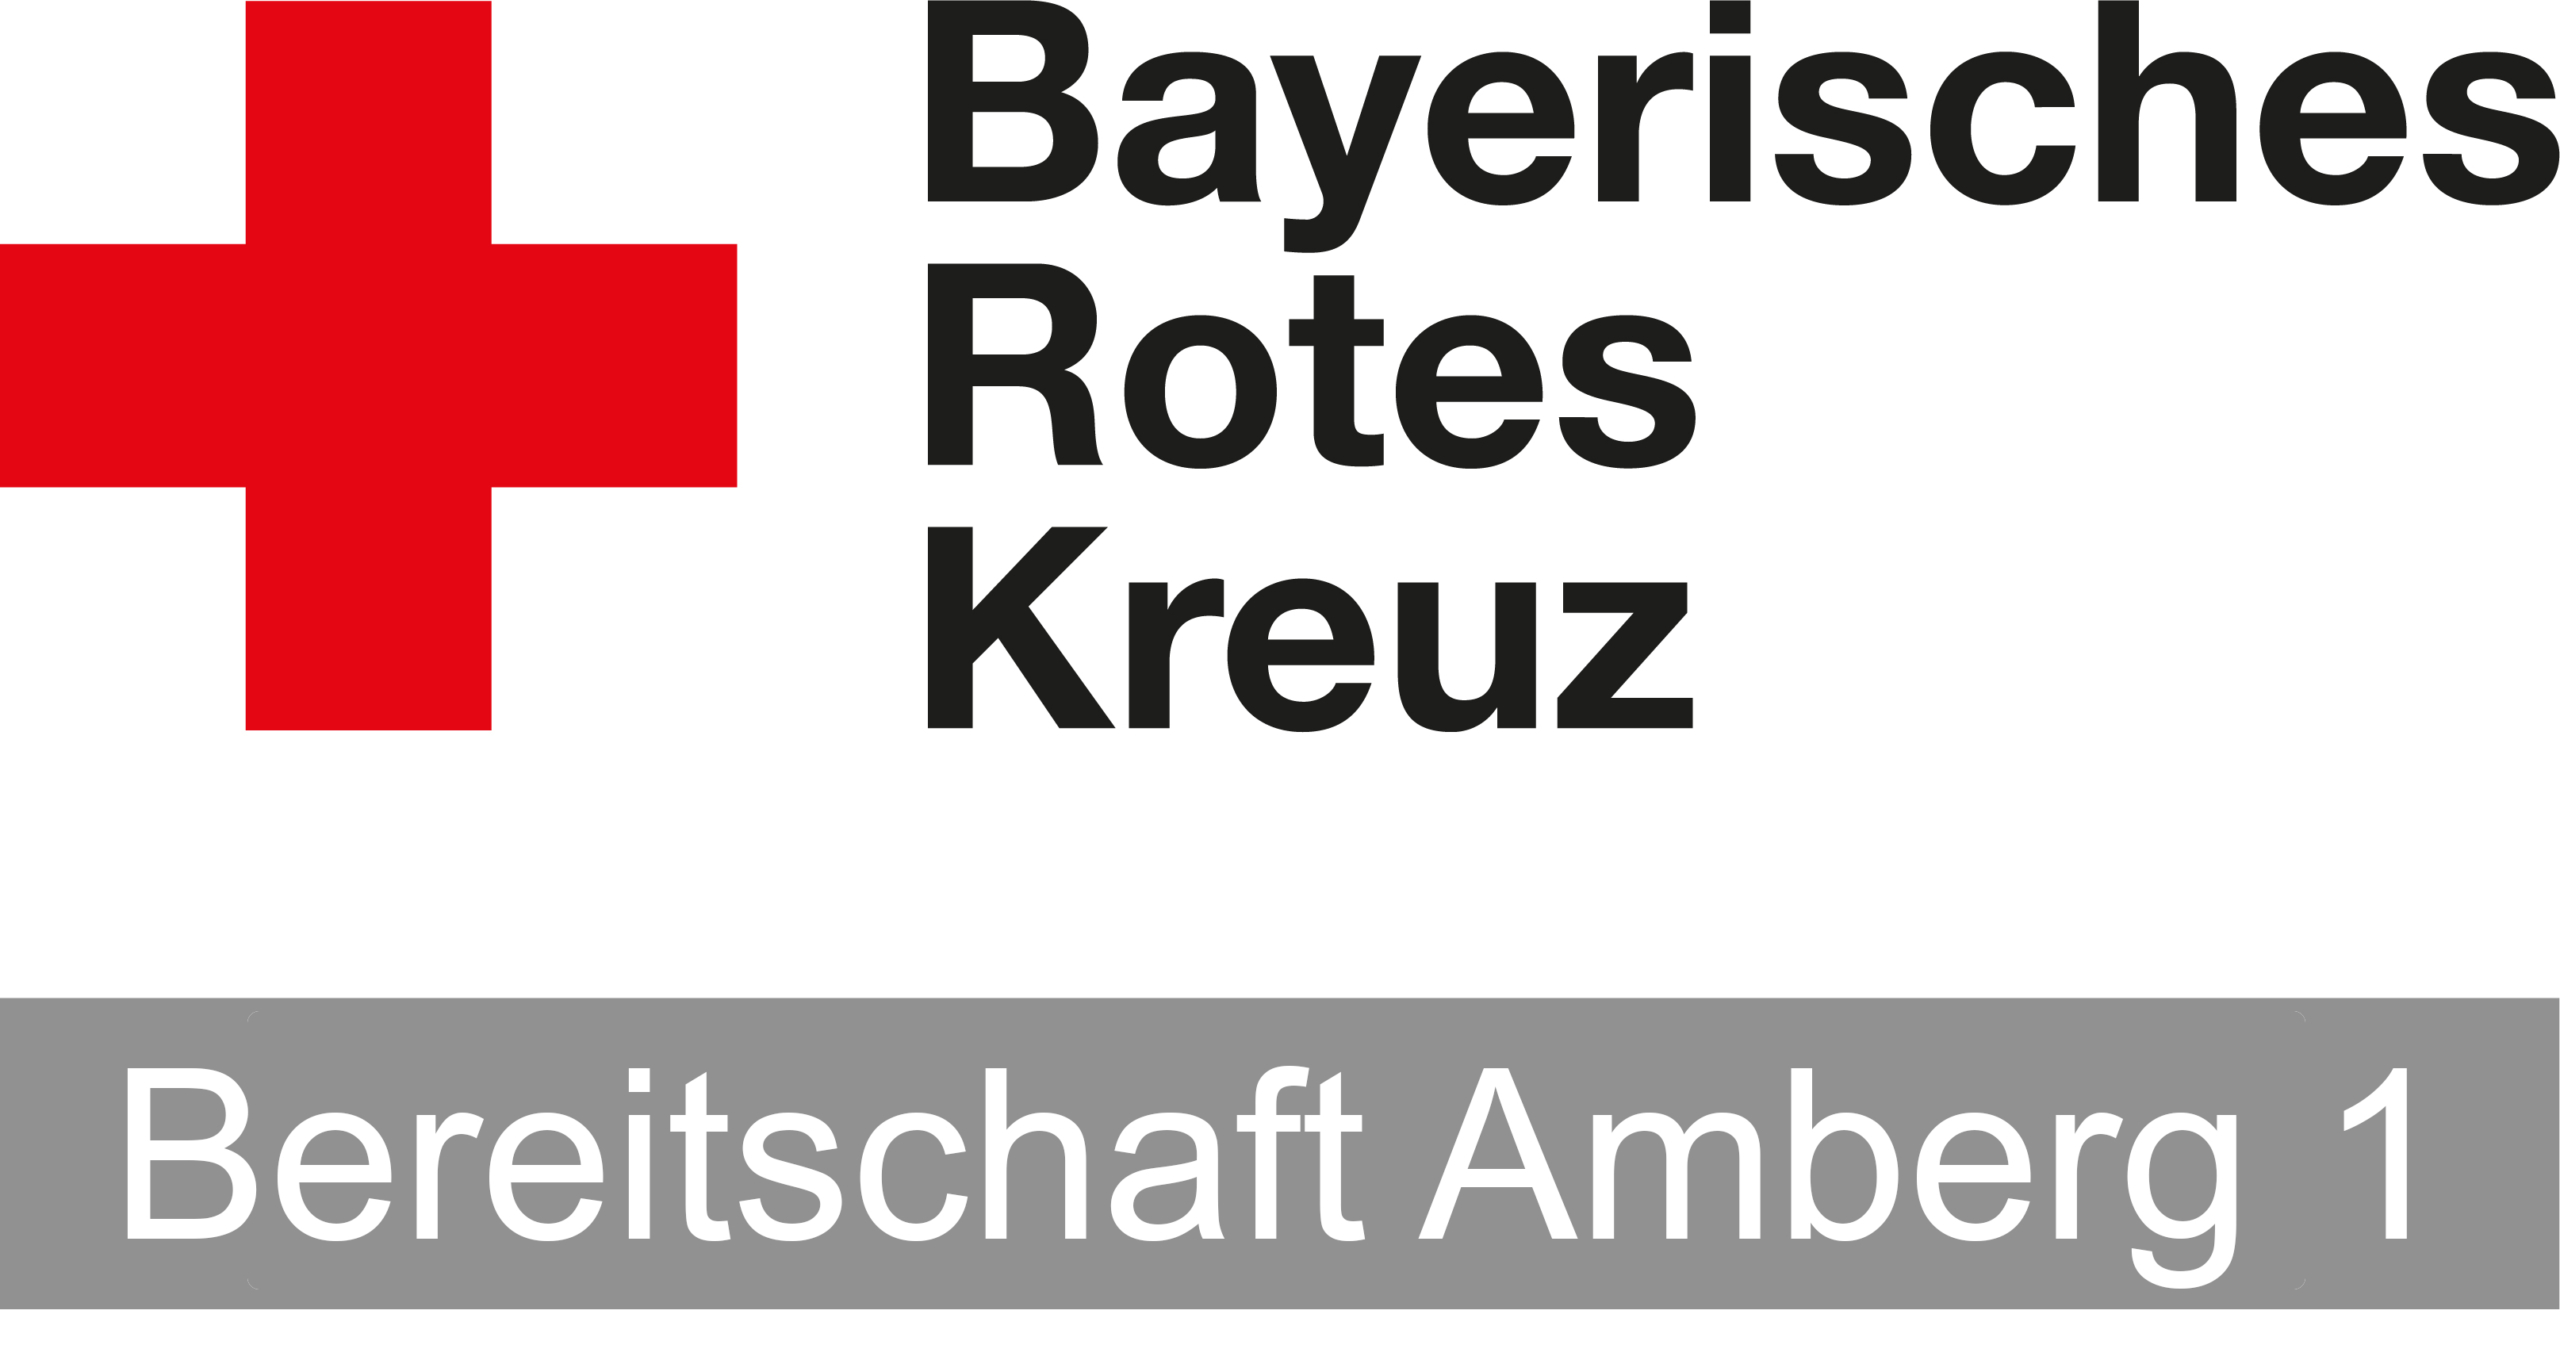 BRK Bereitschaft Amberg 1 Logo